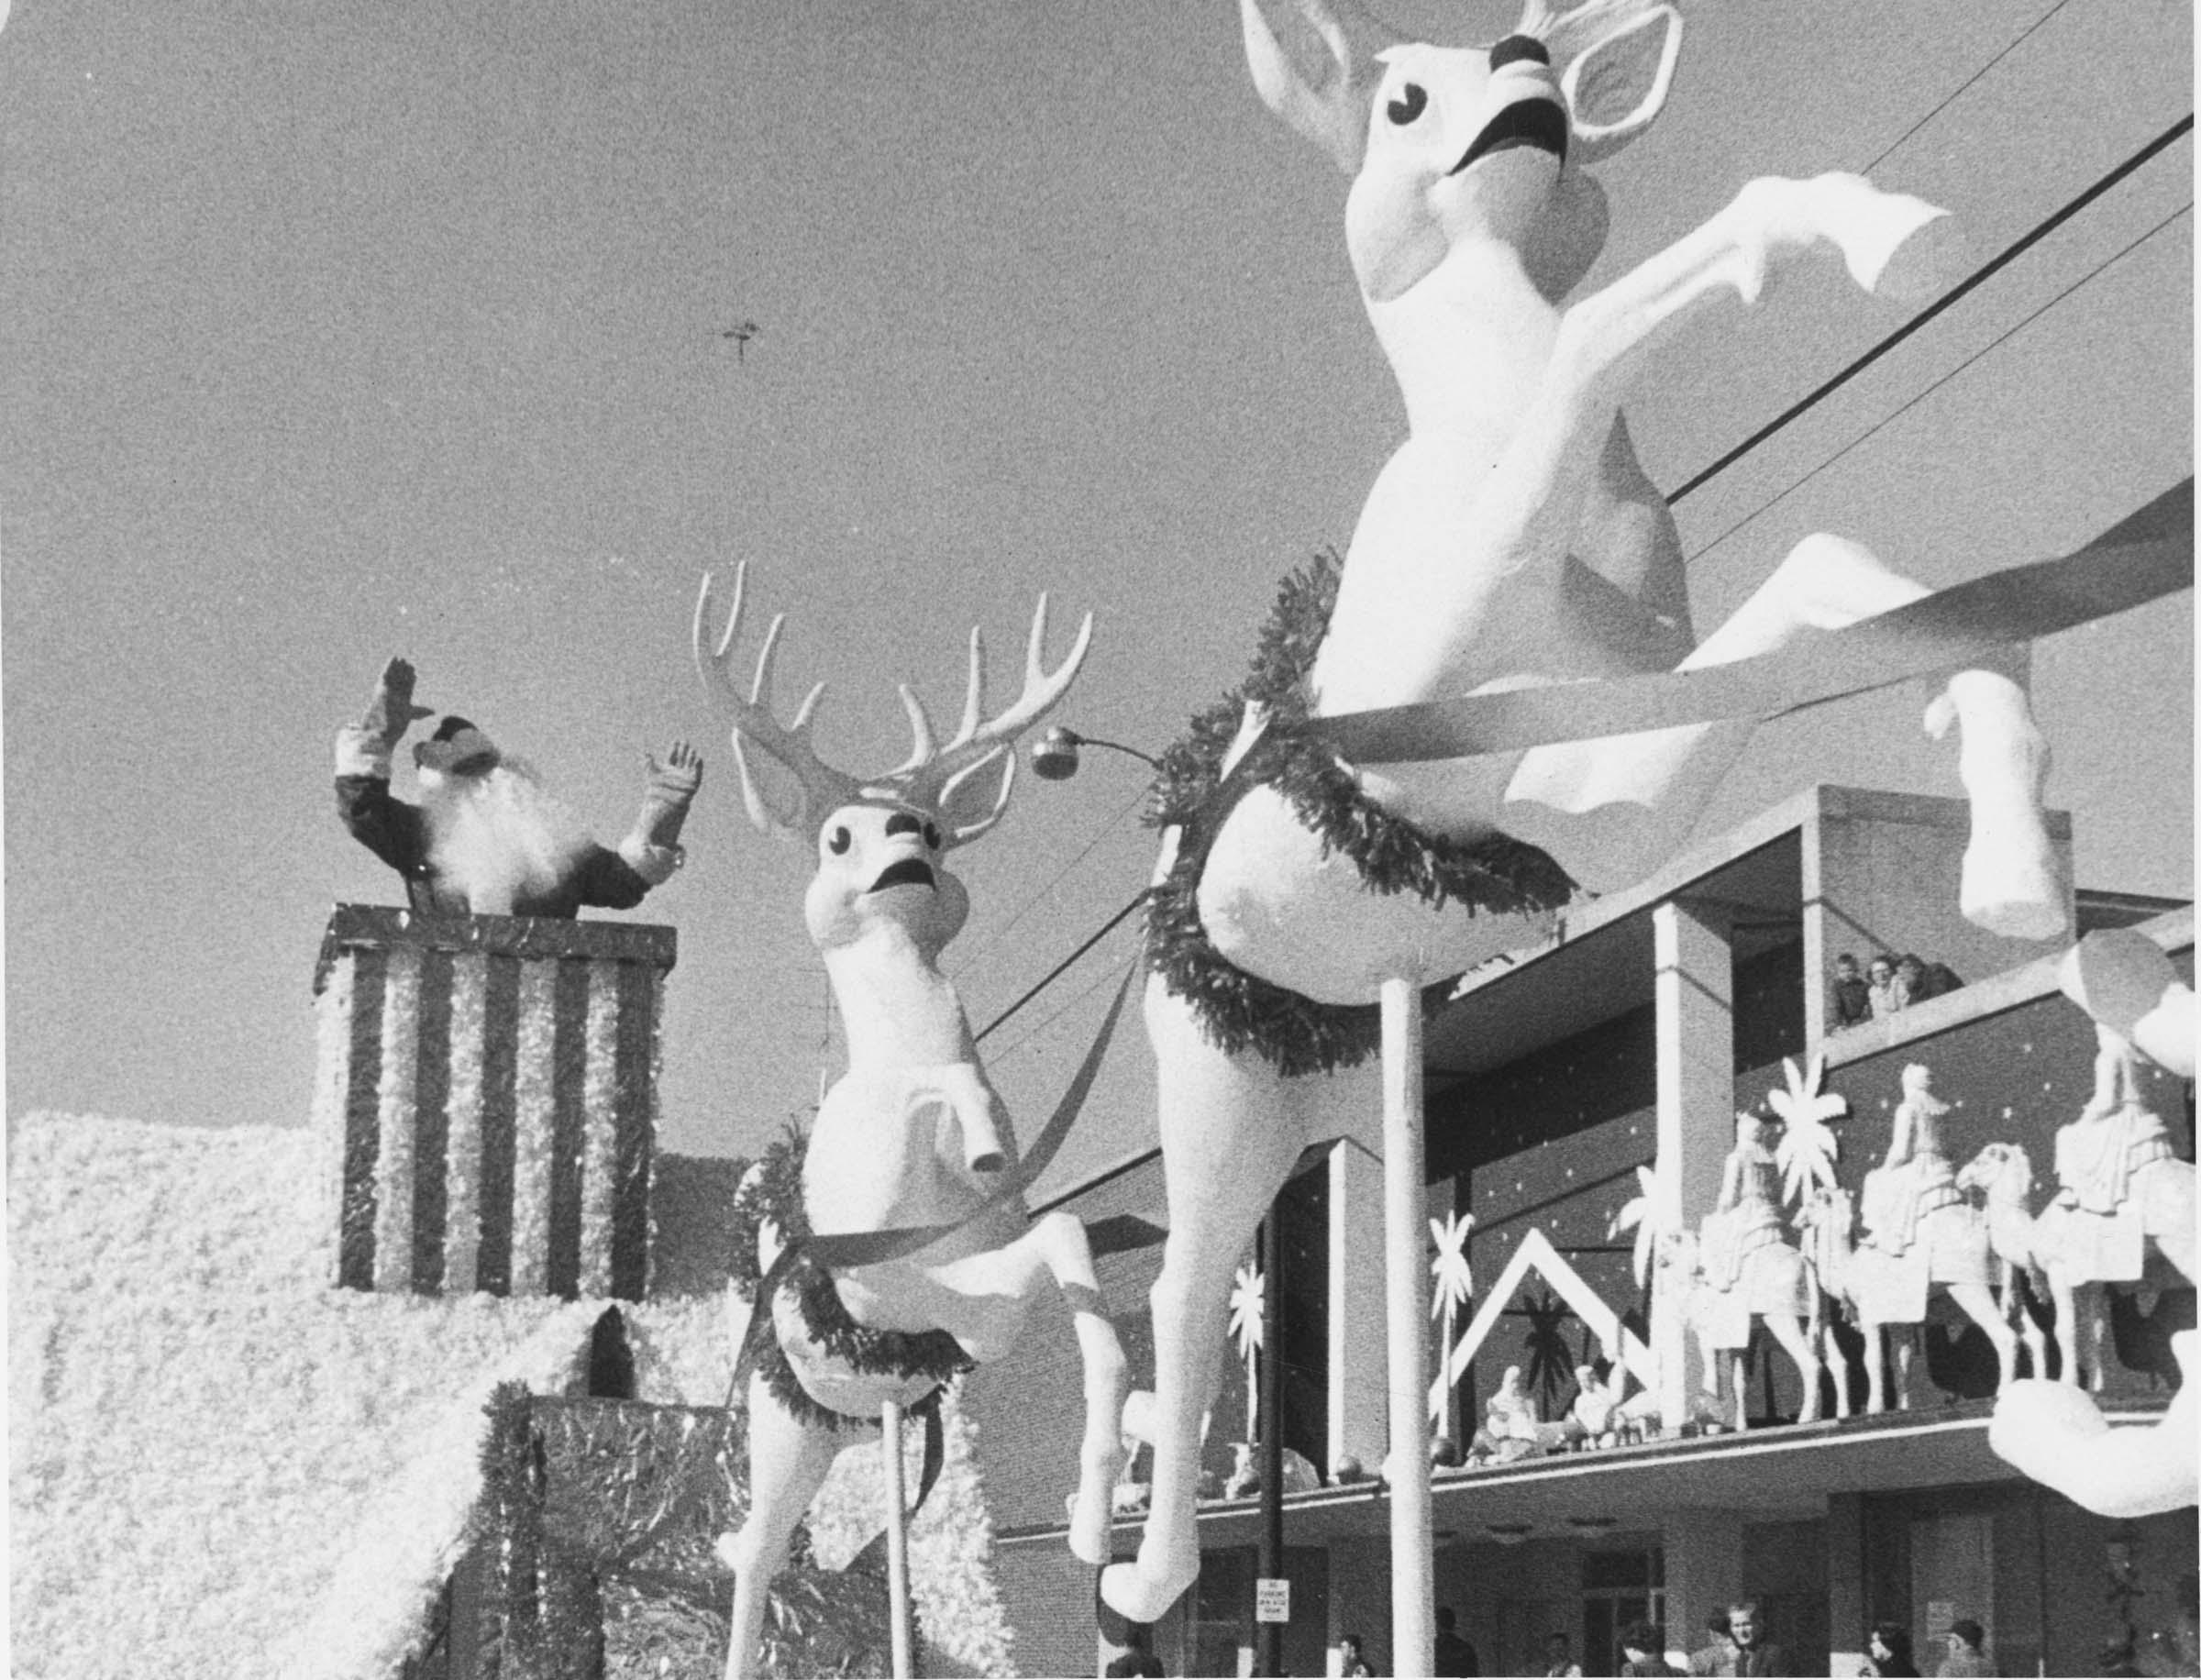 Christmas Memories in Winston-Salem: Part 1 - Winston-Salem